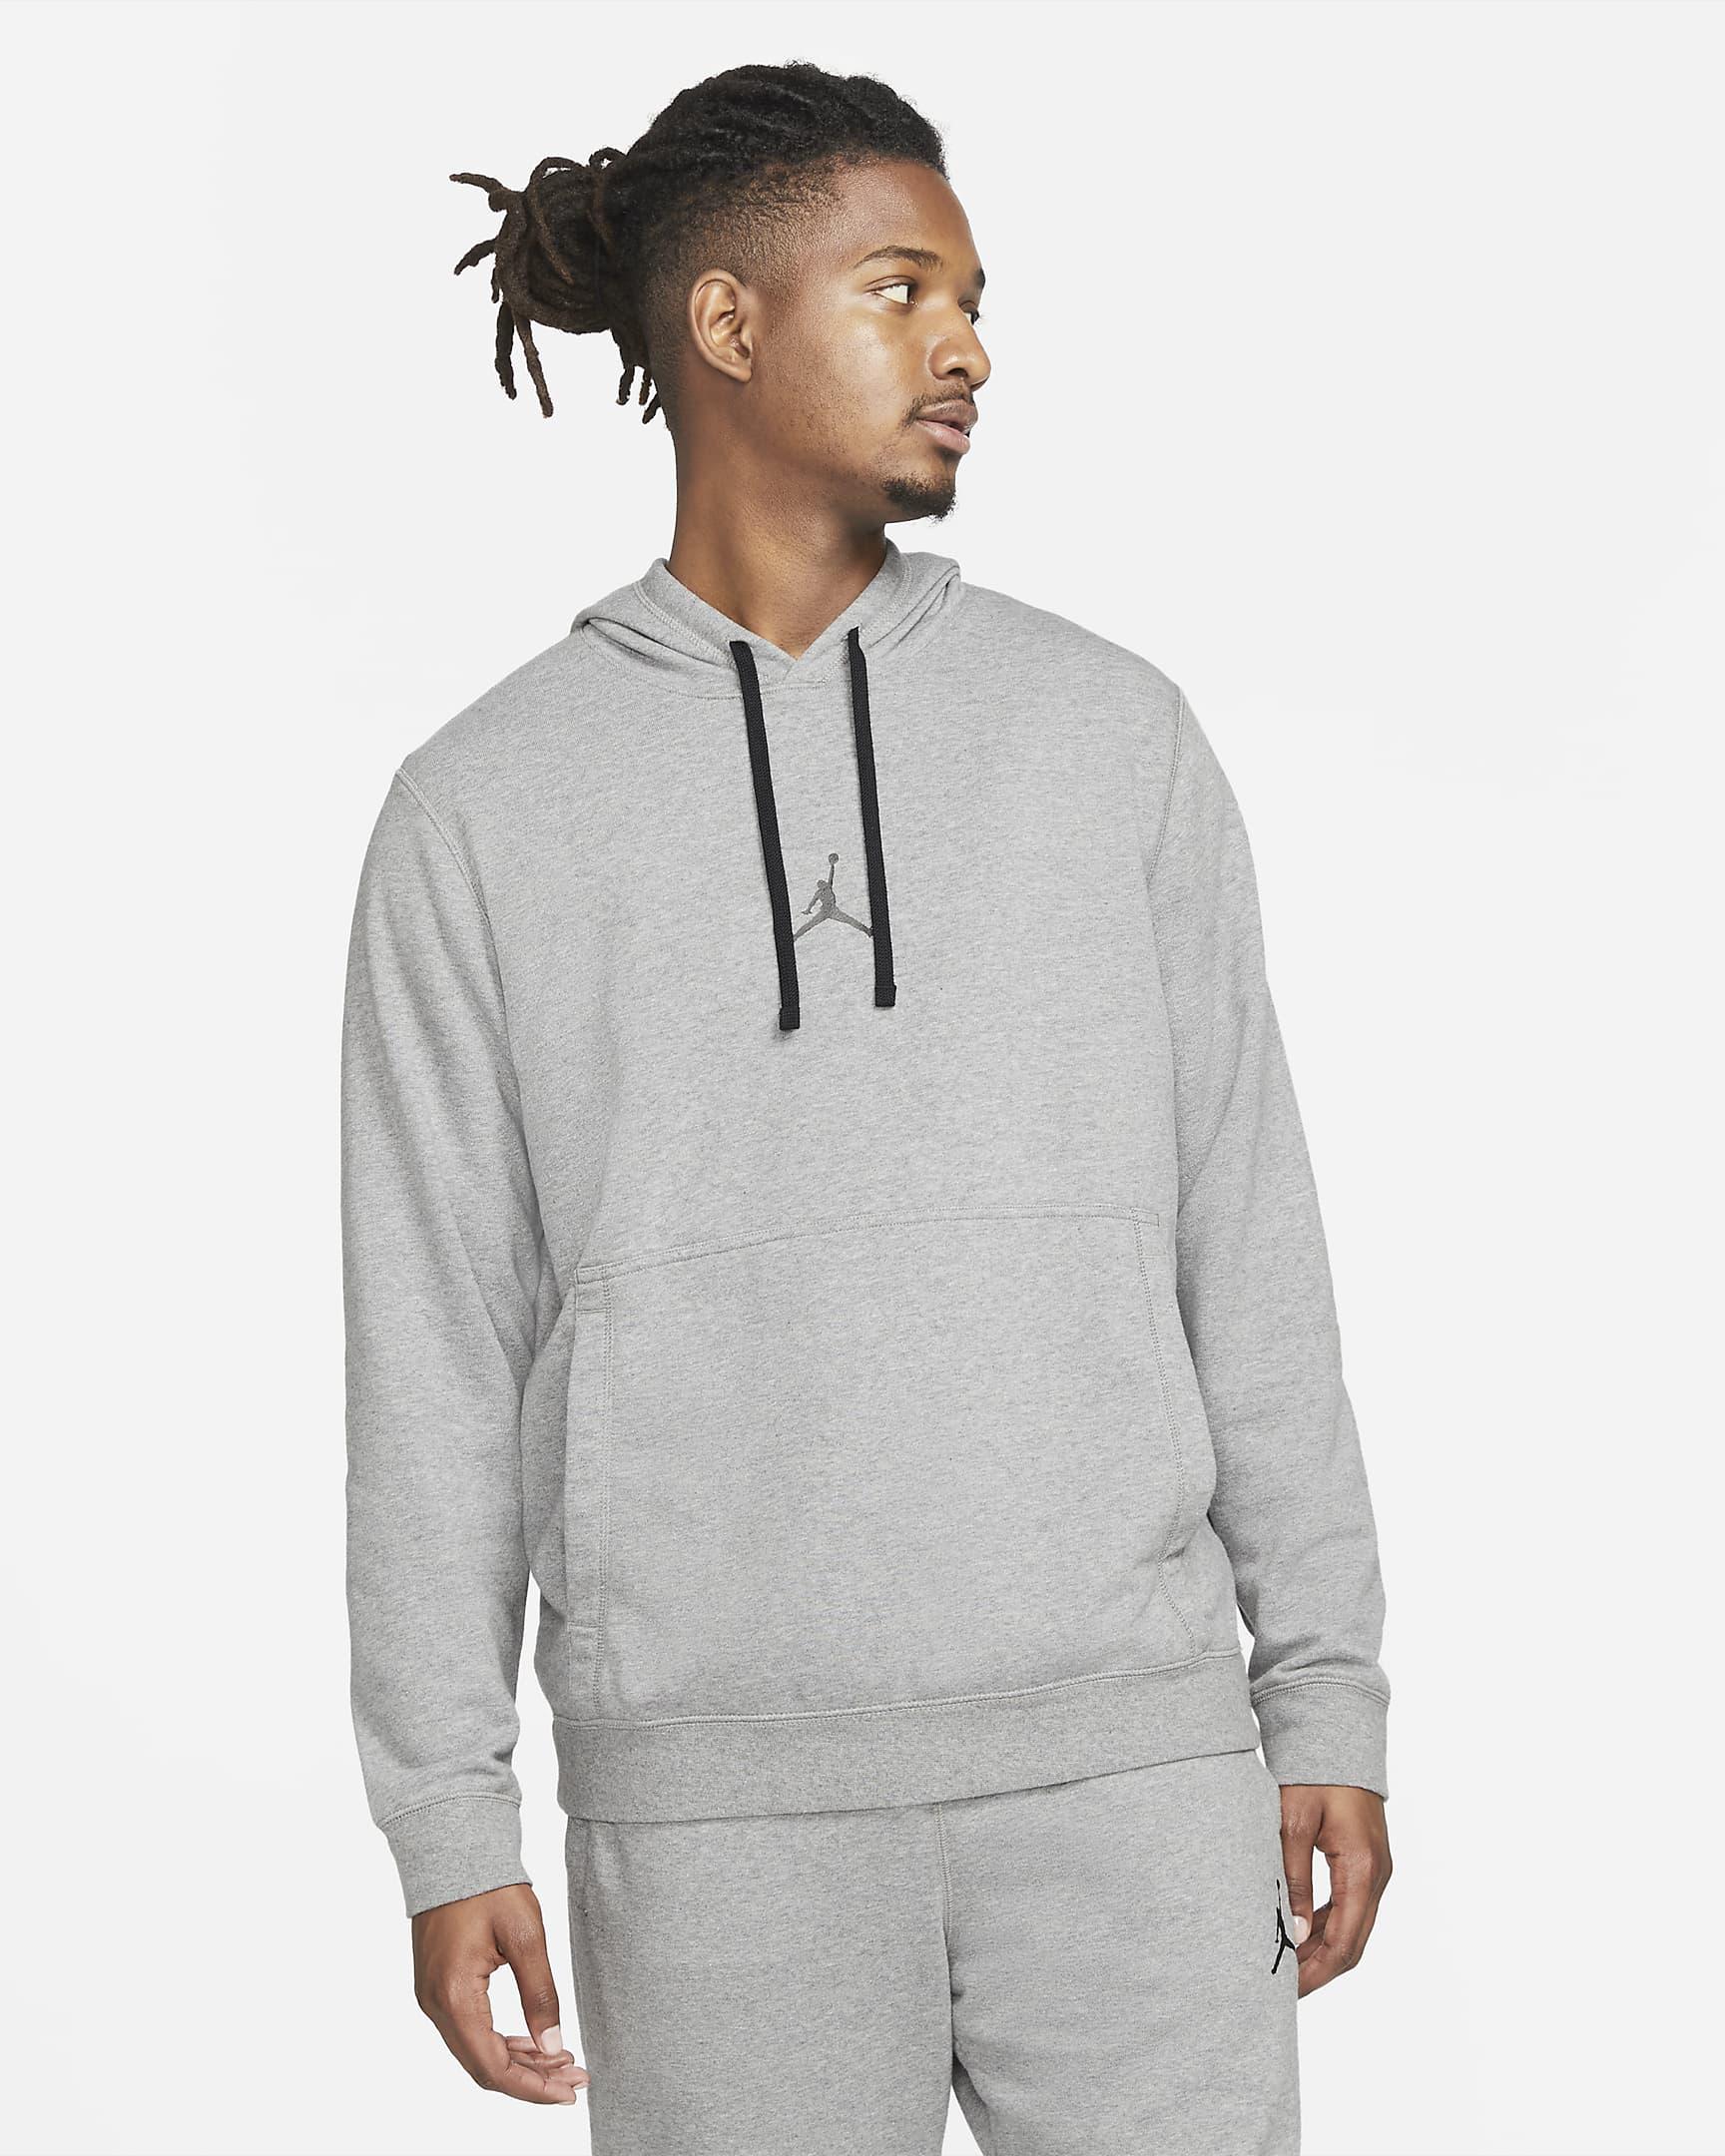 jordan-dri-fit-air-mens-fleece-pullover-hoodie-wT5ZhX.png